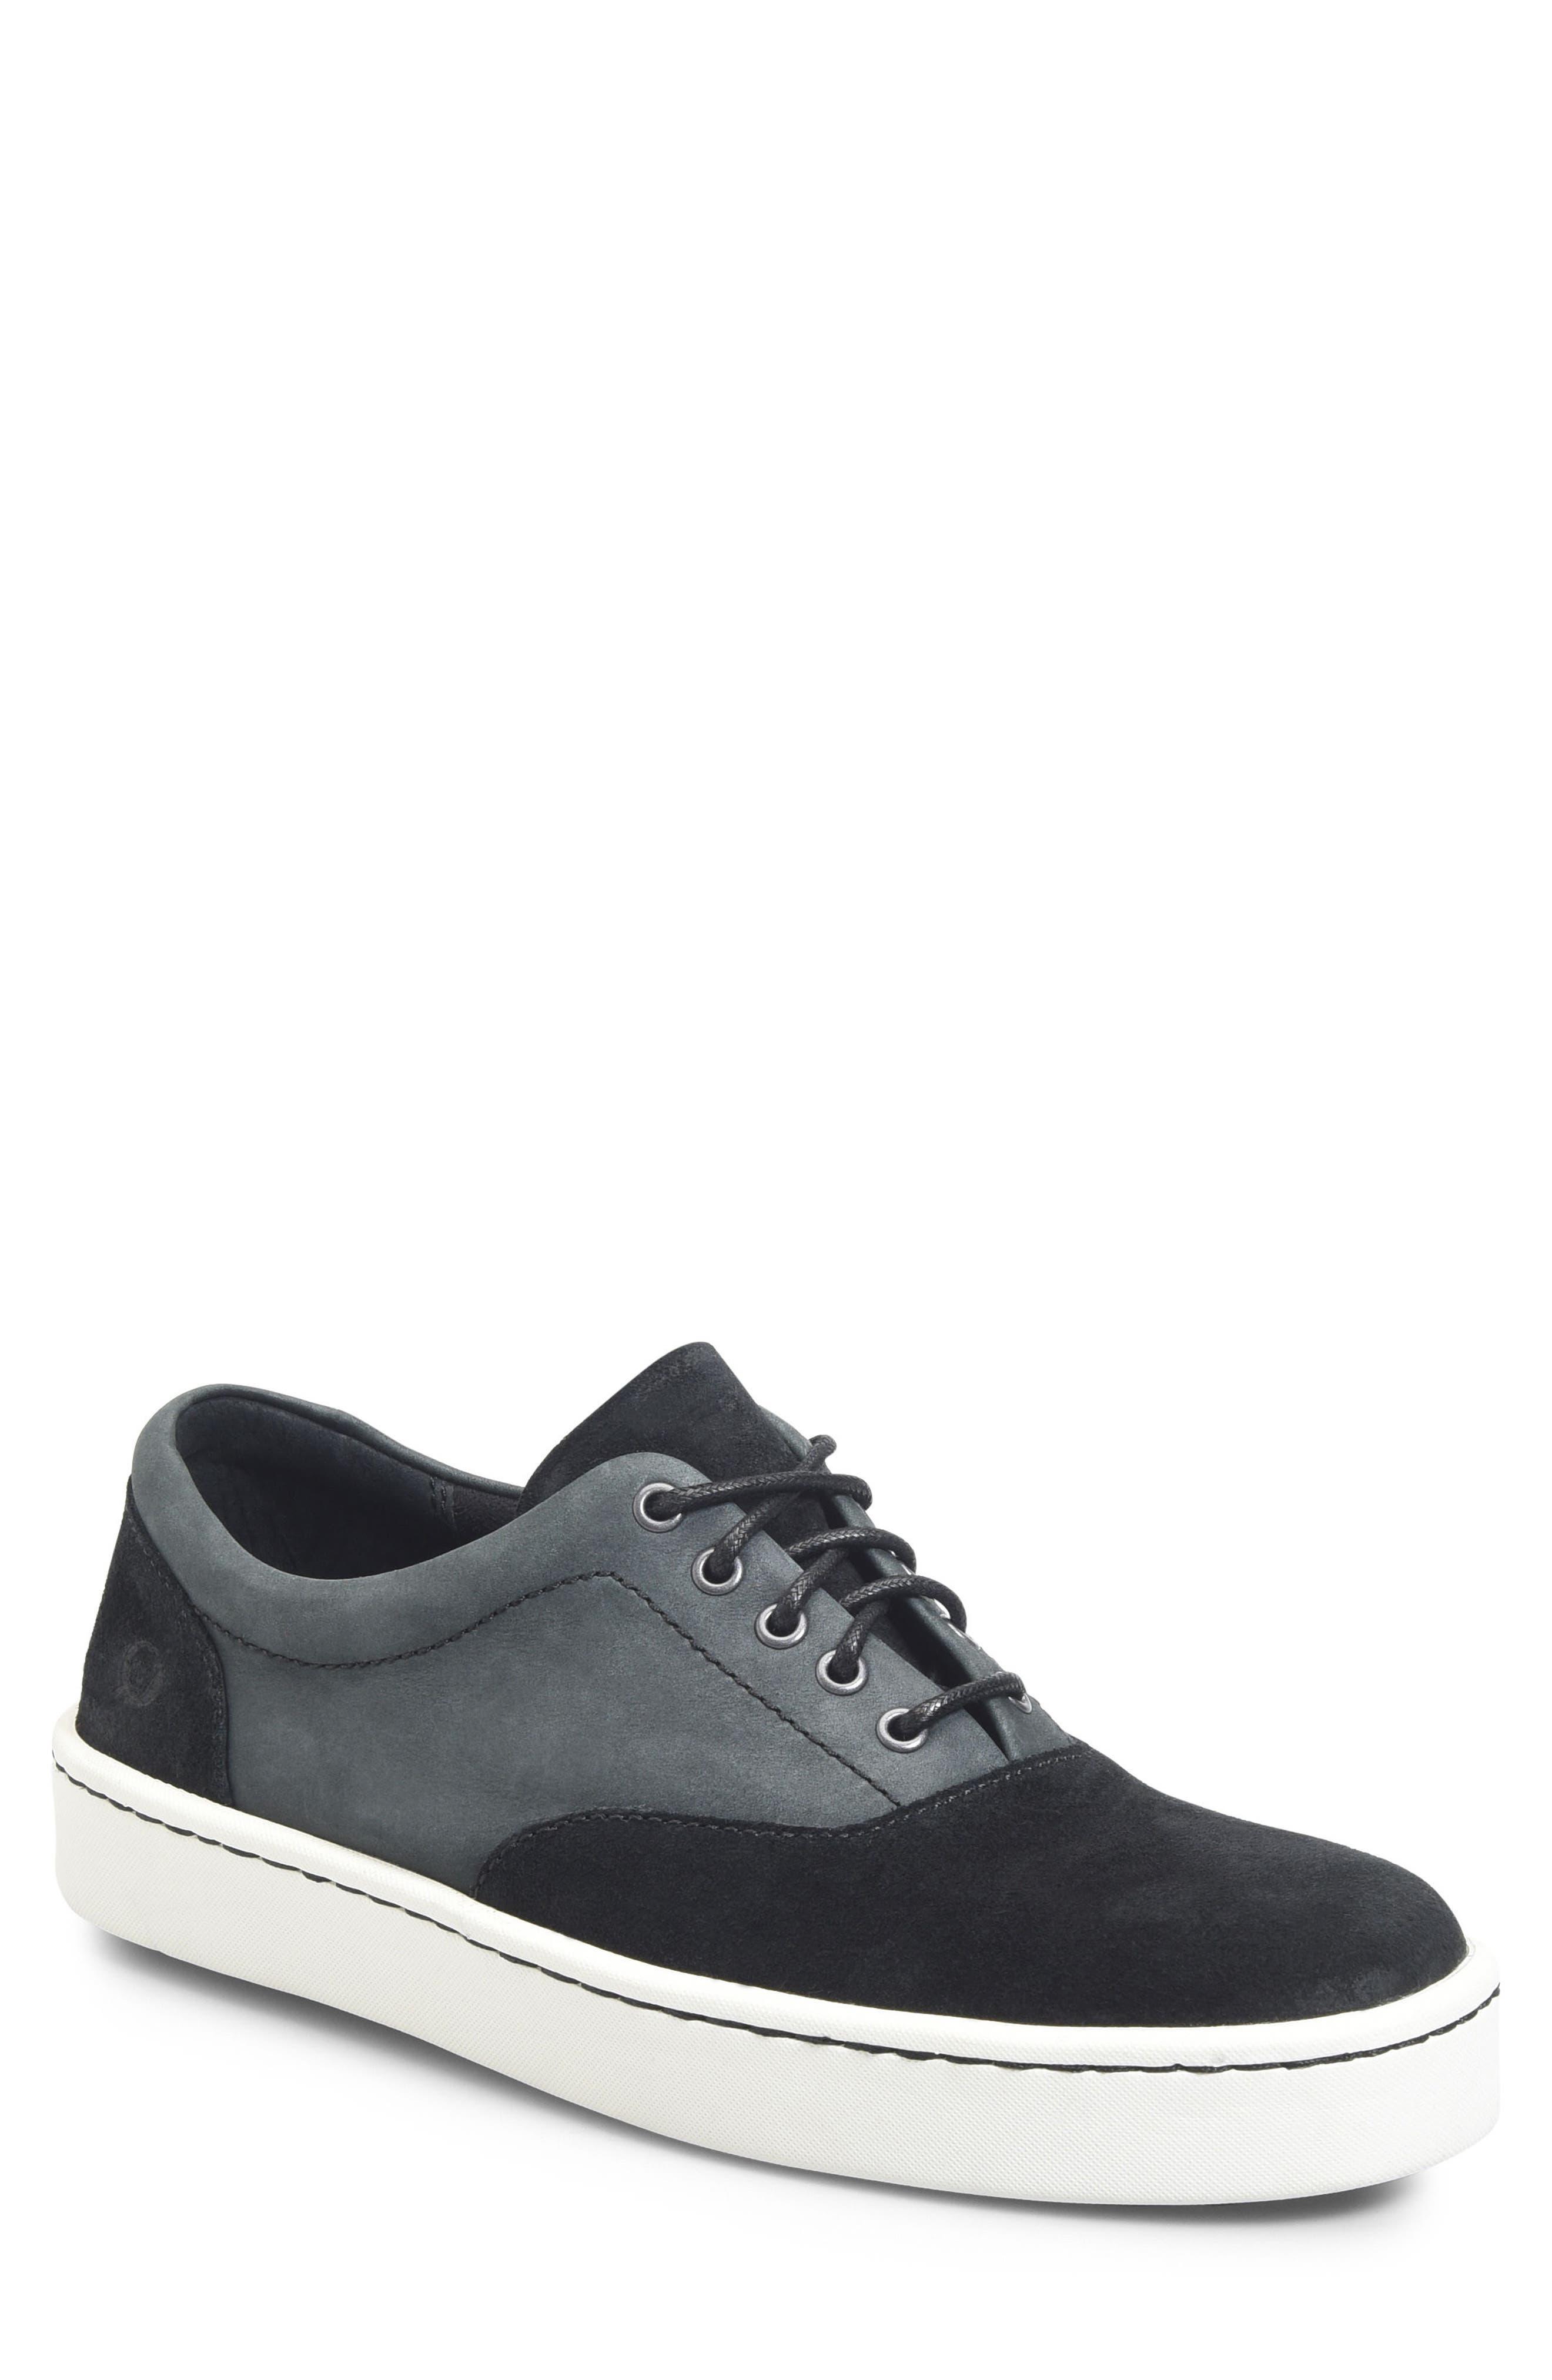 Keystone Low Top Sneaker,                         Main,                         color, 001